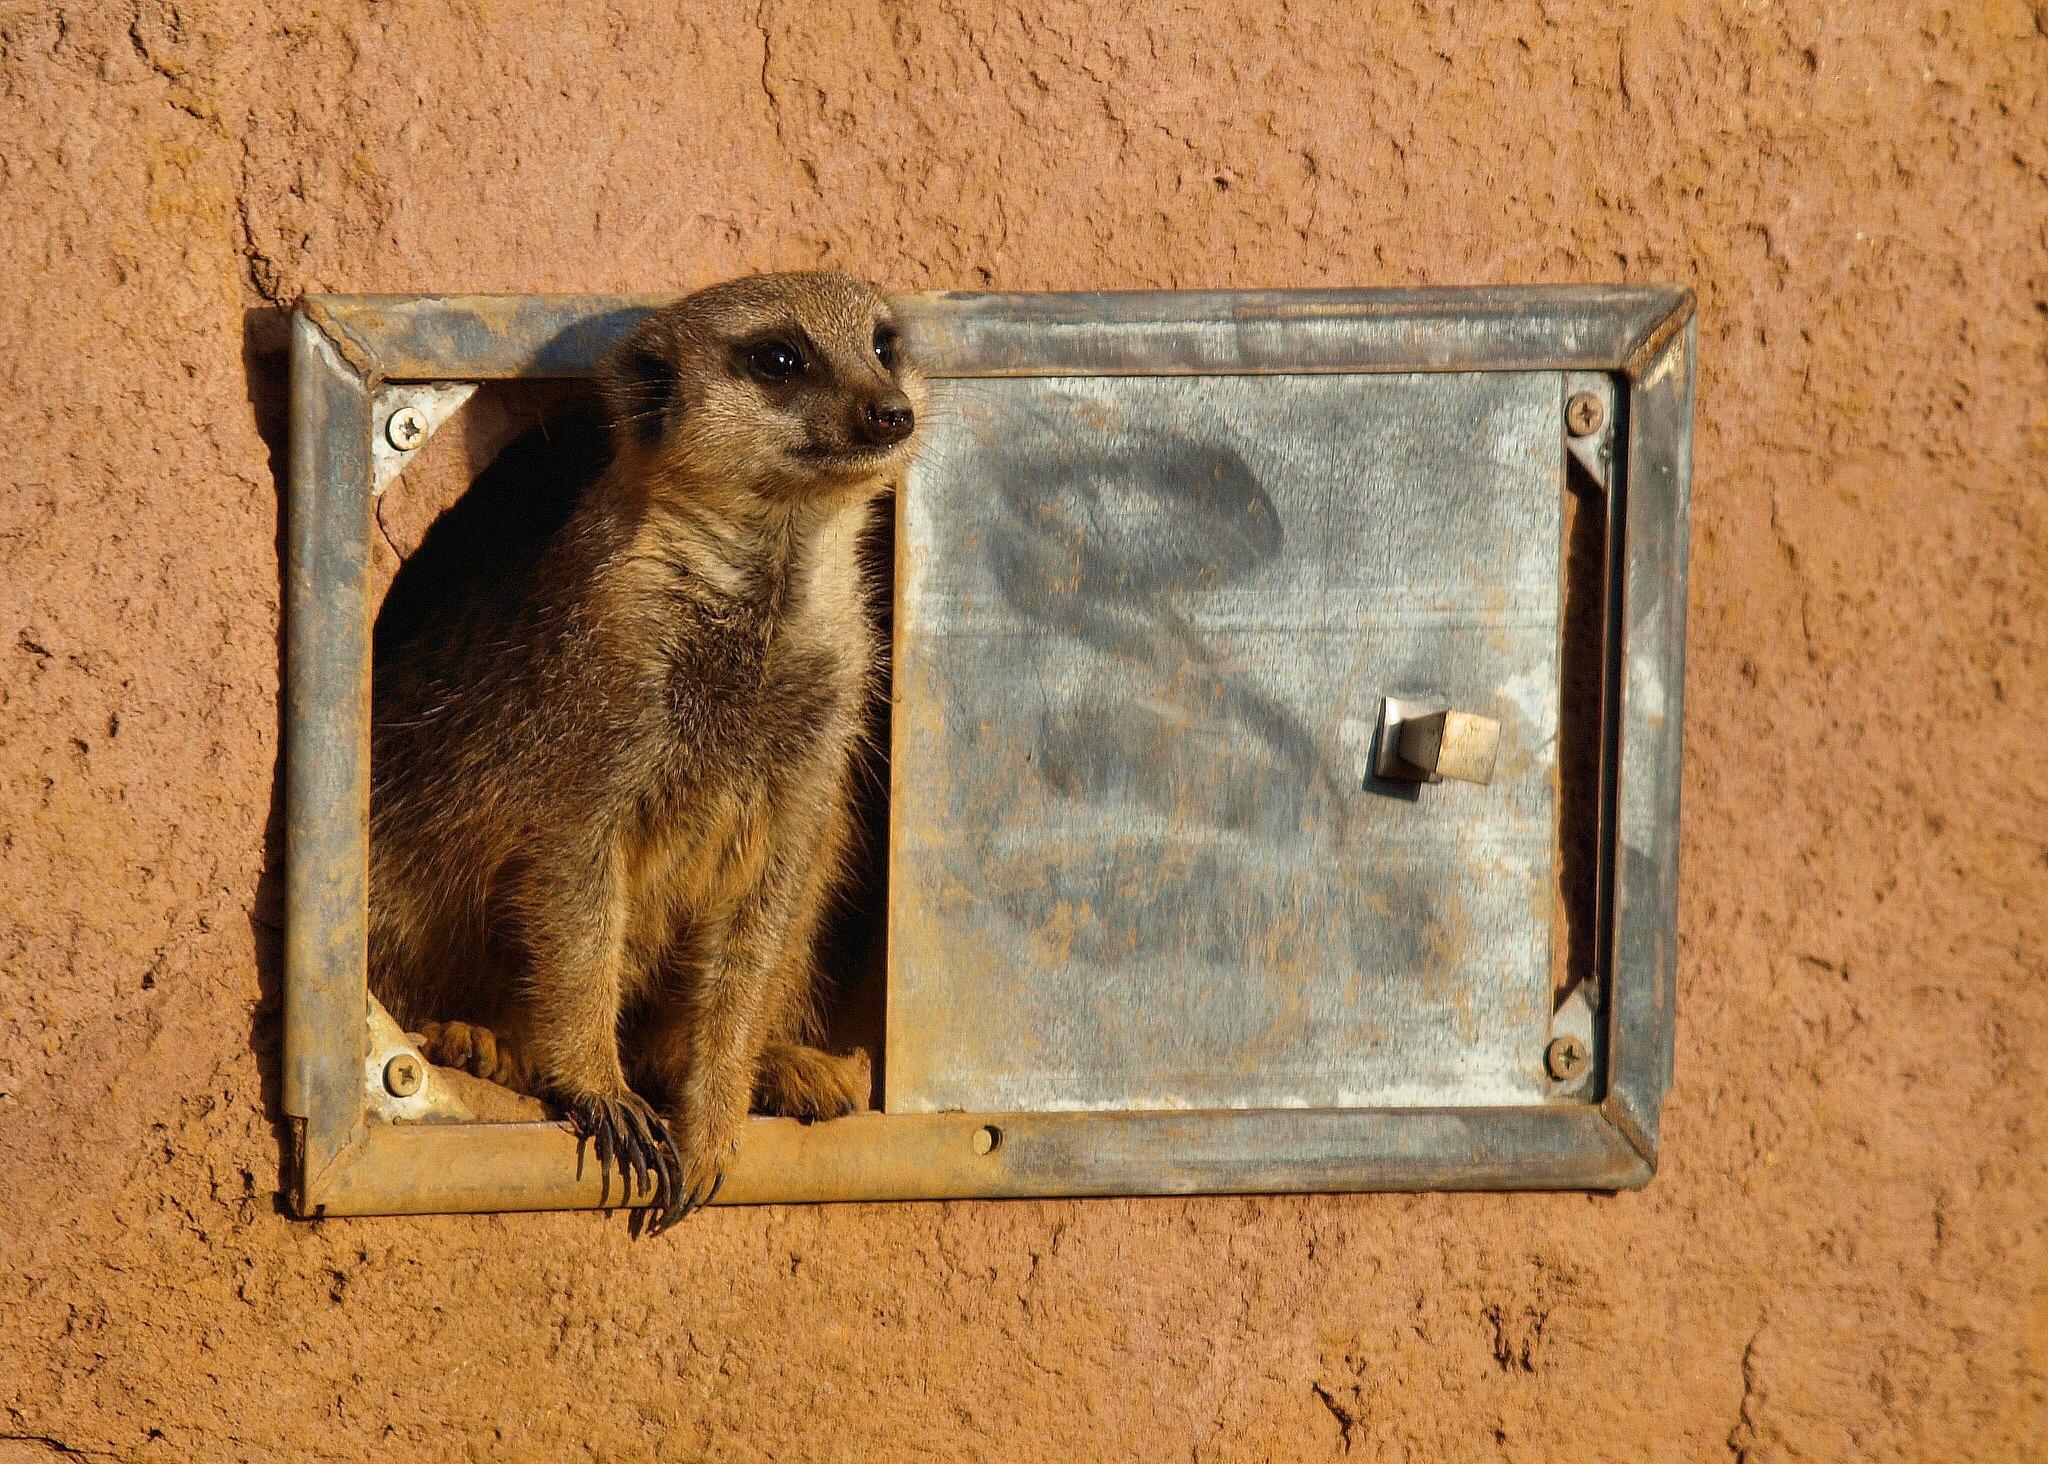 Meerkat by timpreston